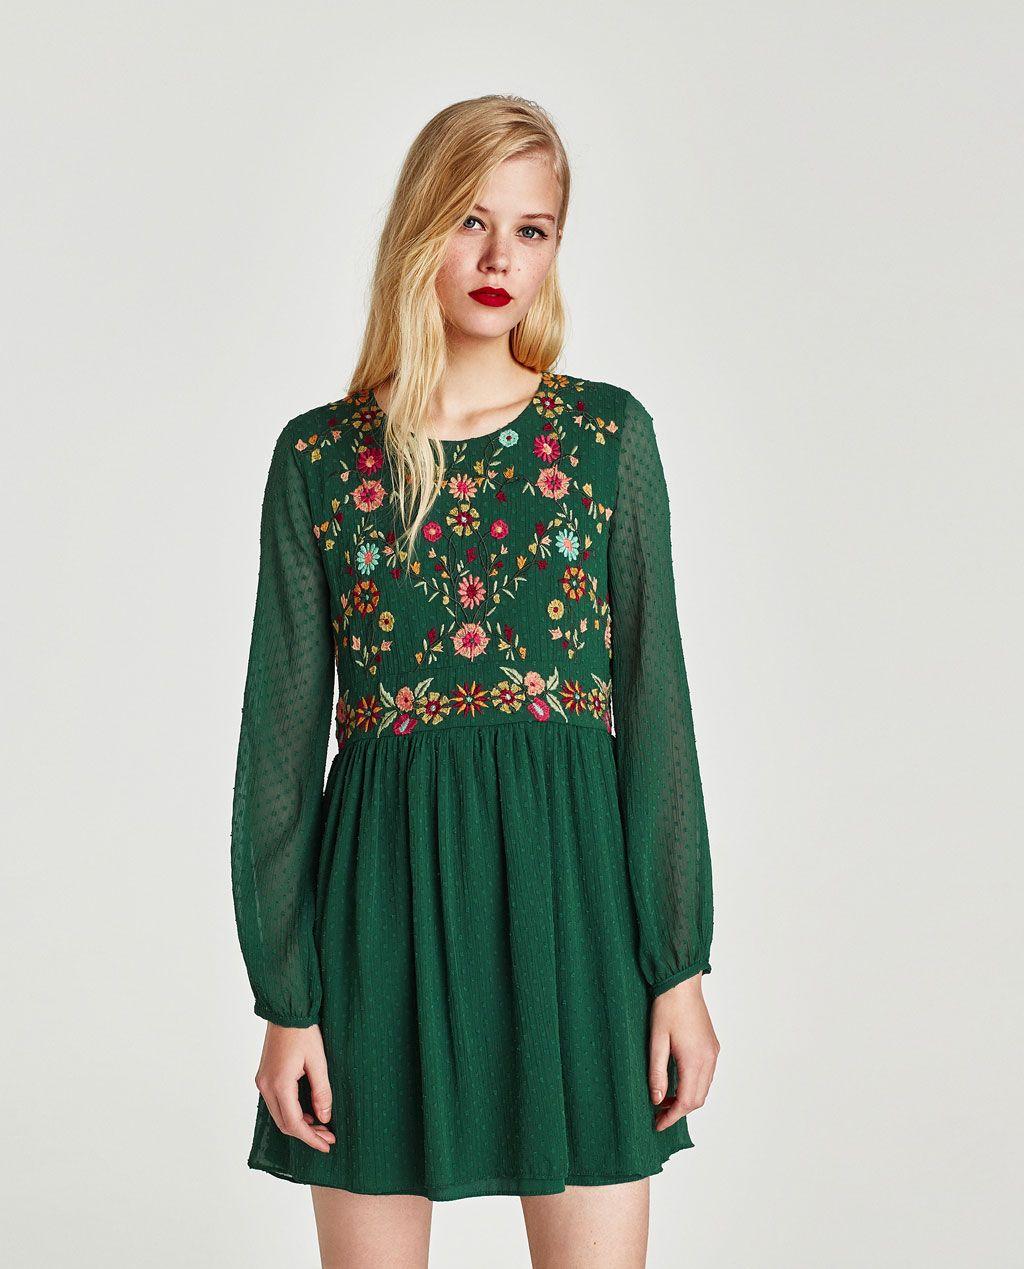 zara green dress floral